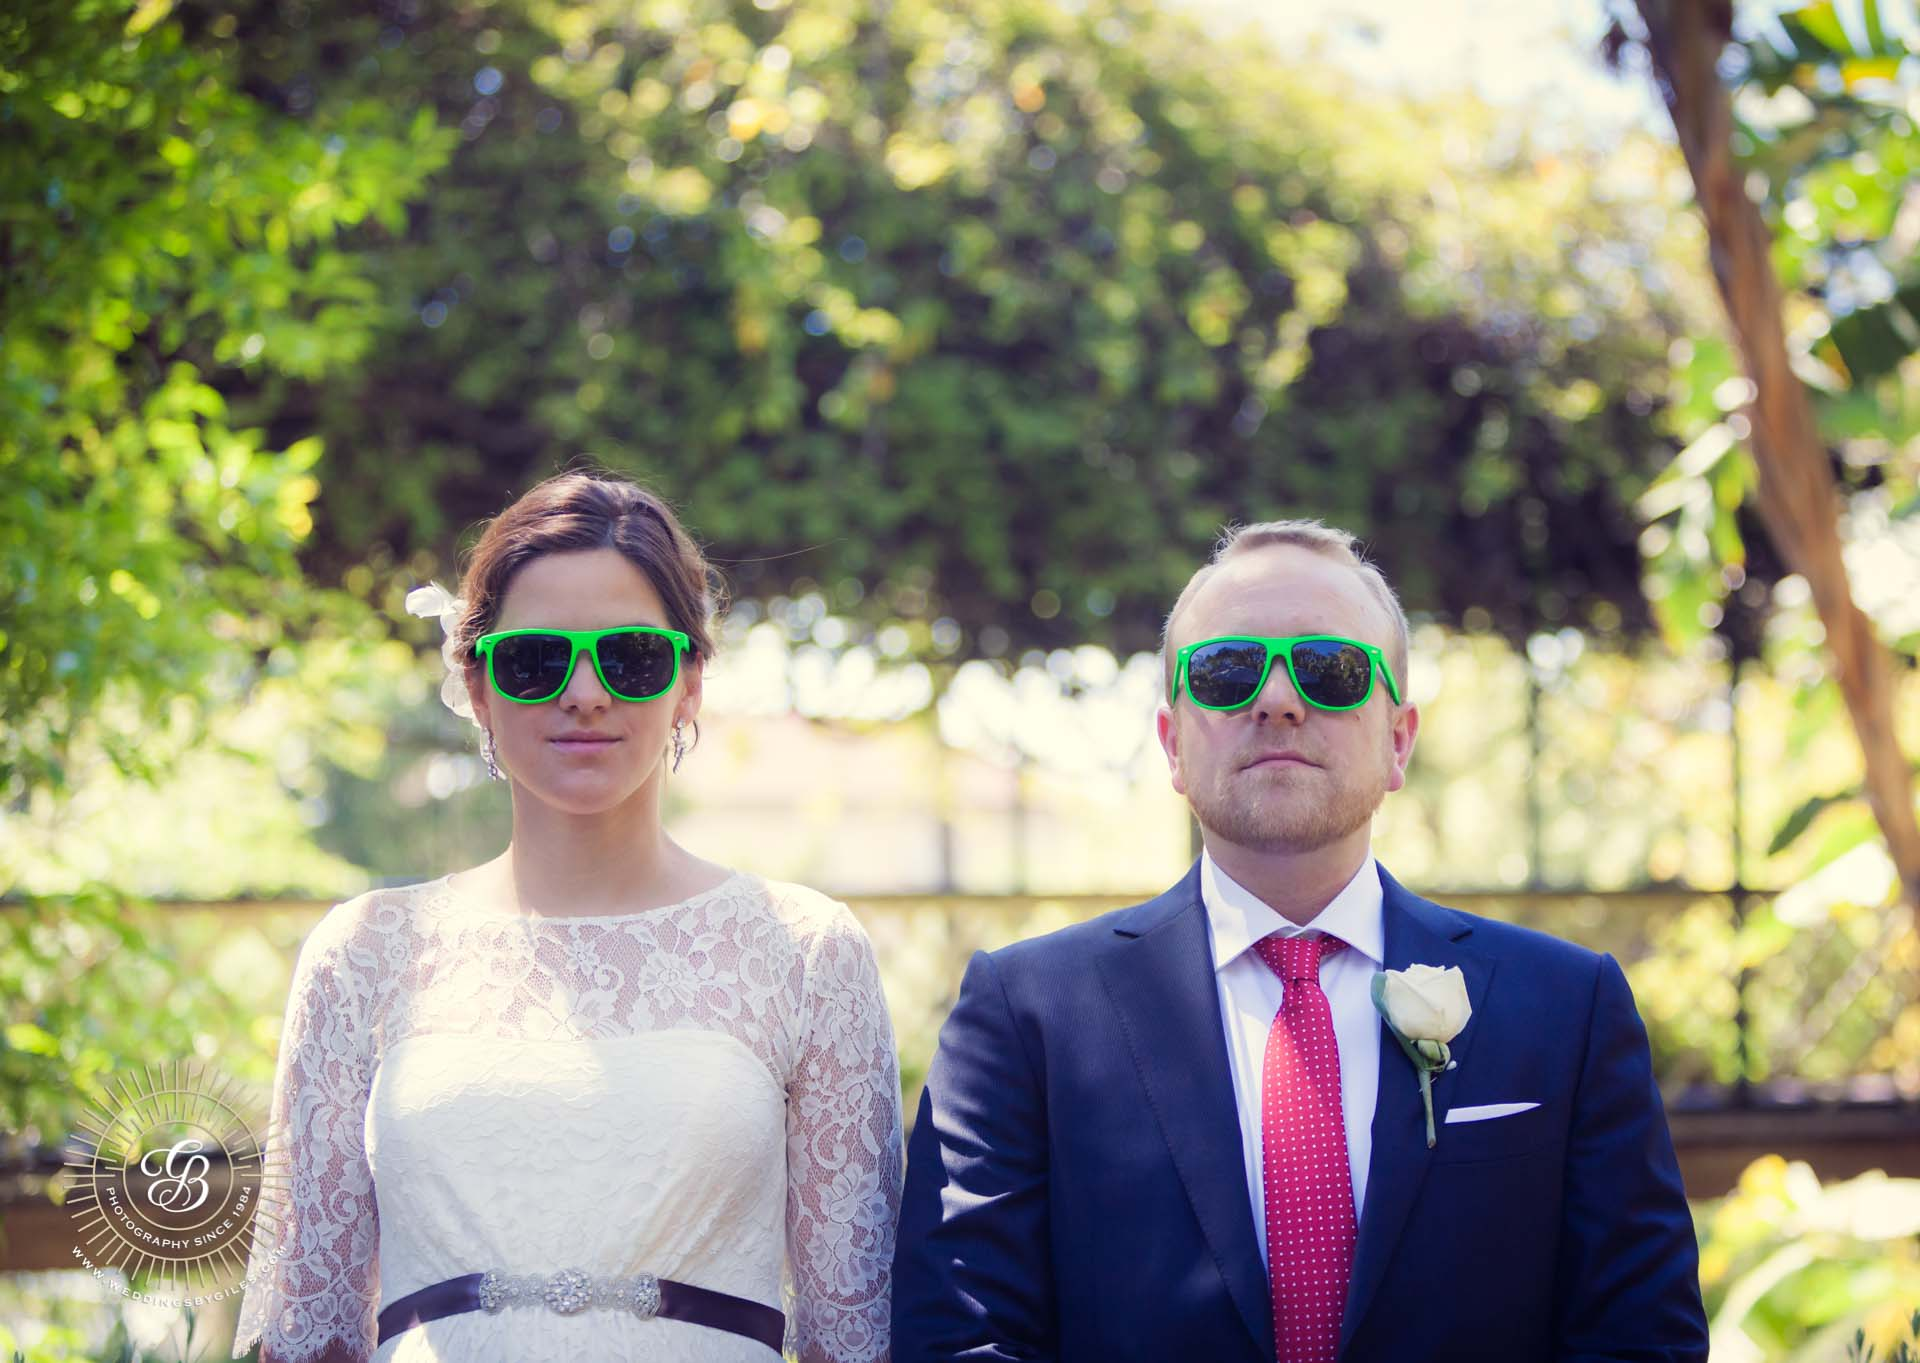 themed wedding sunglasses